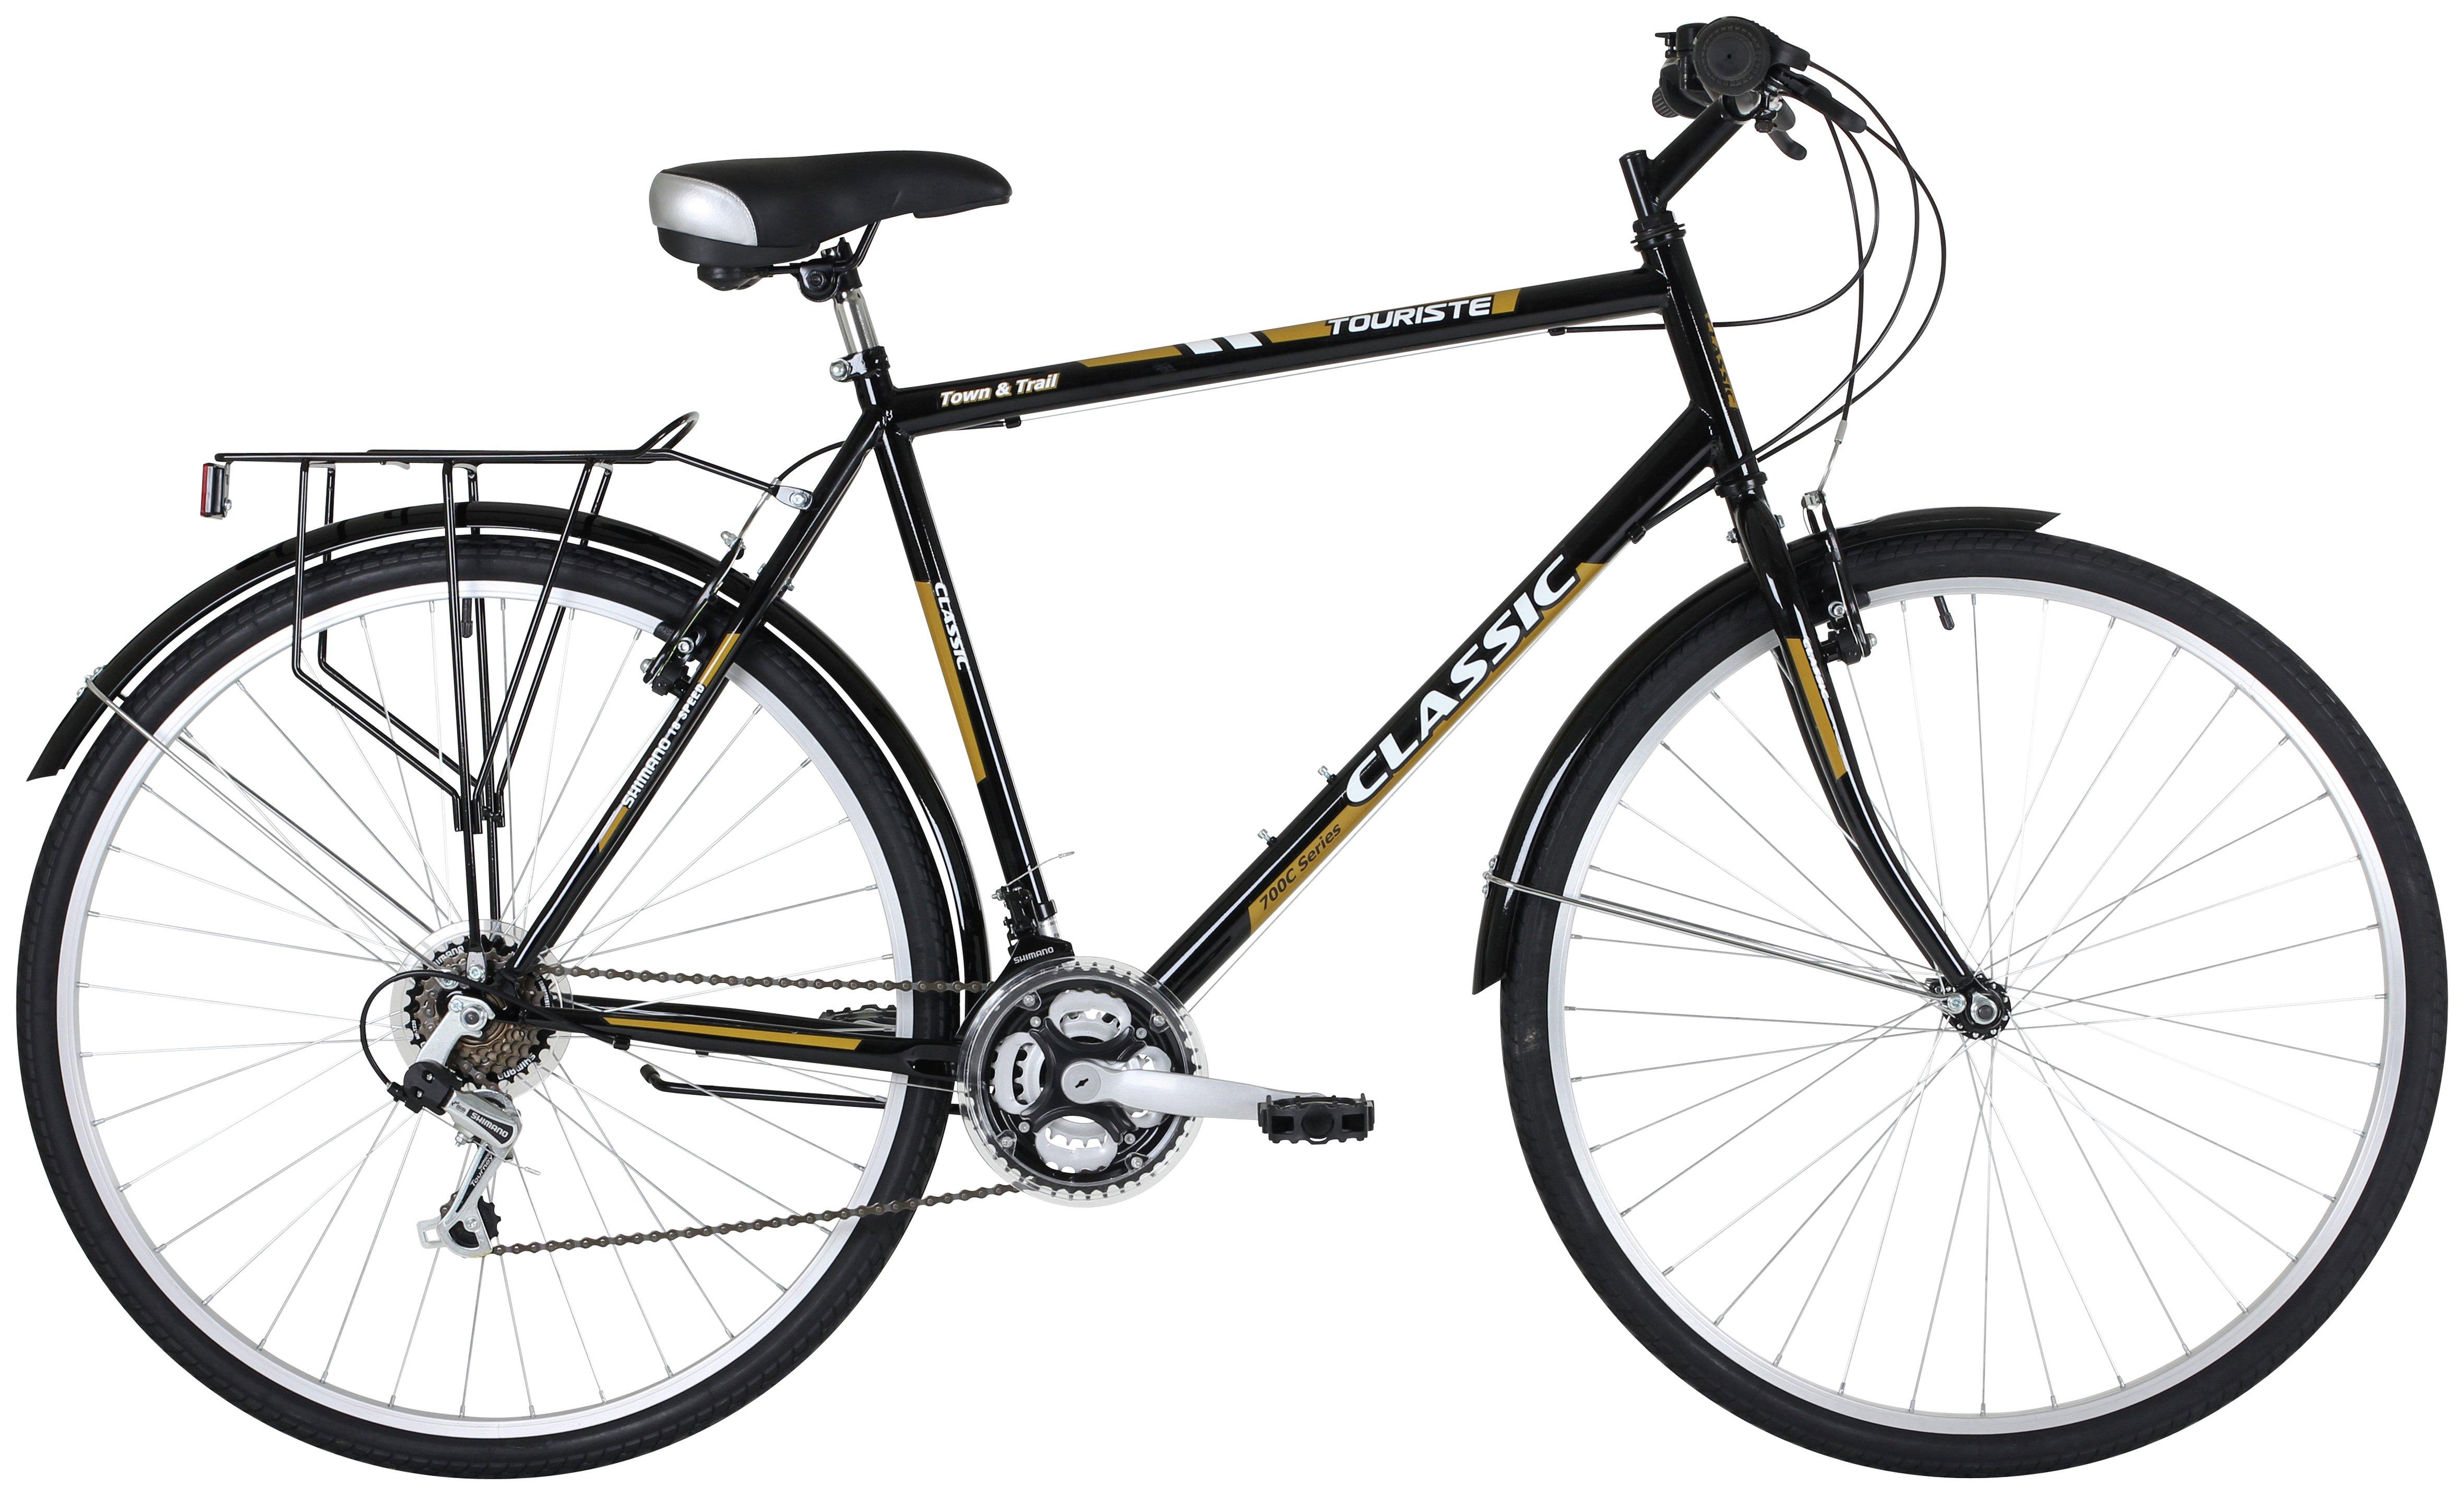 Image of Classic Touriste 700C Commuter Hybrid Bike - Mens